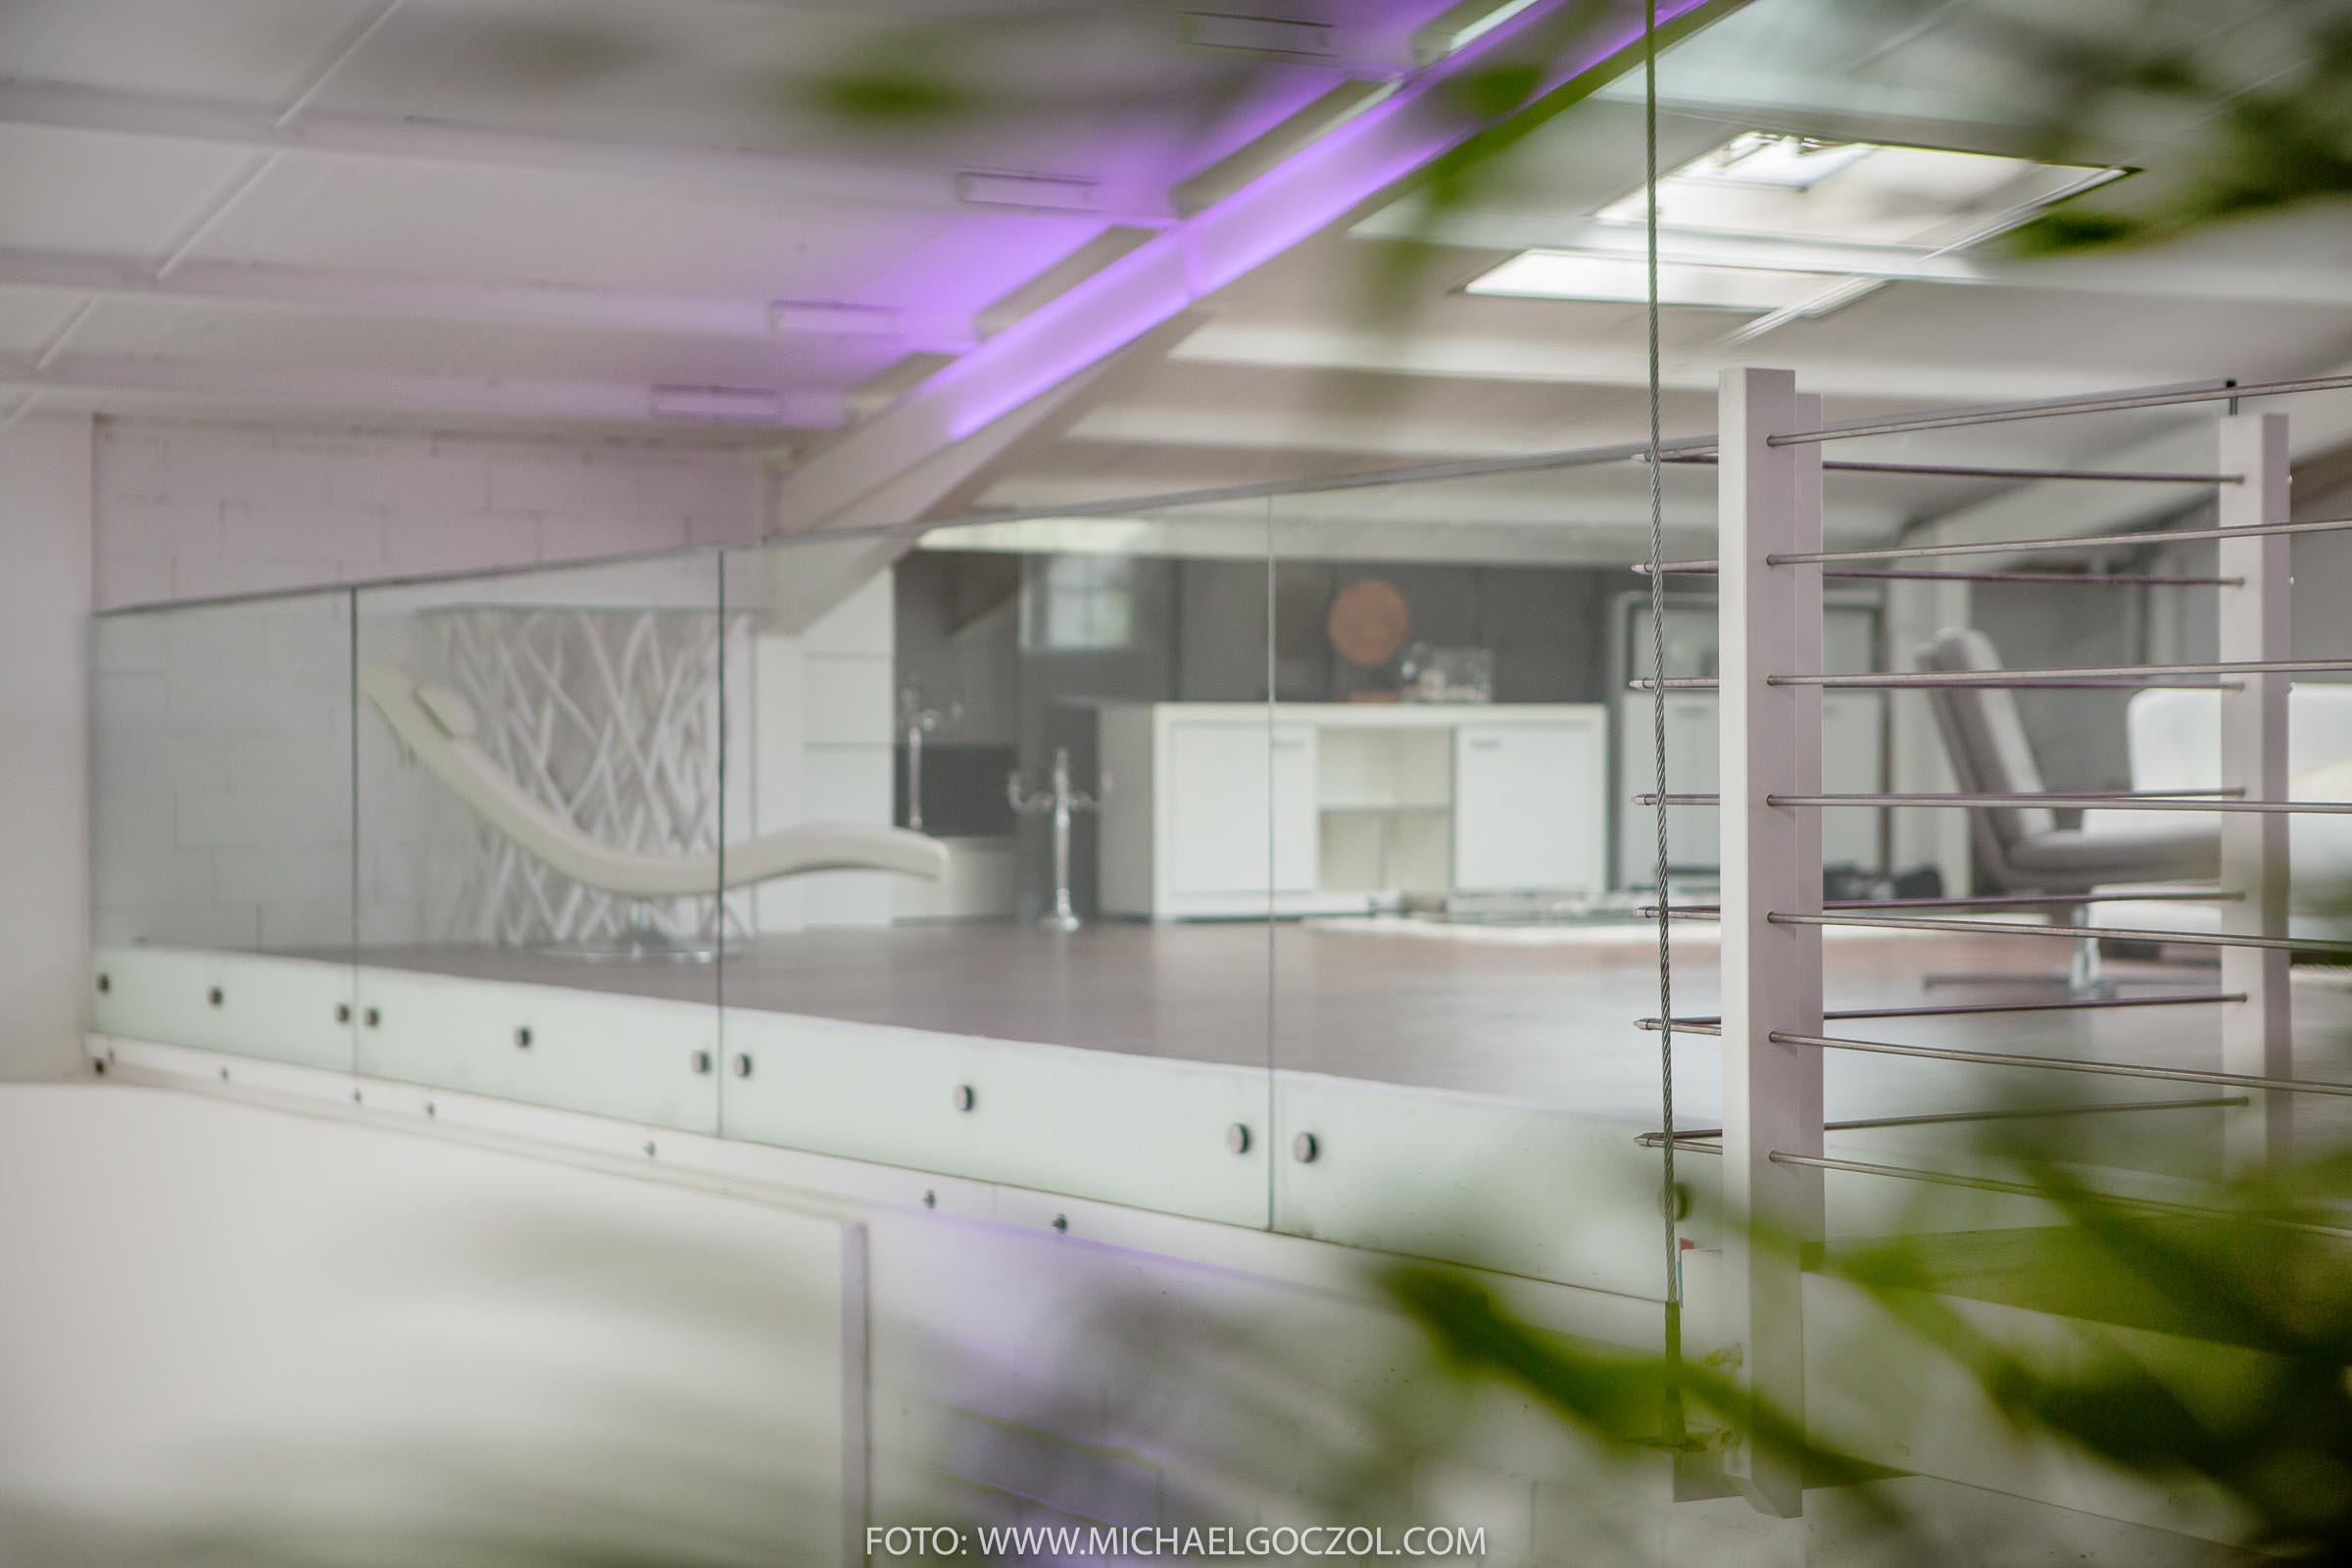 RoofOneStudio Mietstudio Fotostudio Eventlocation Loft Industrieloft Studio Frankfurt am main Oberursel 27